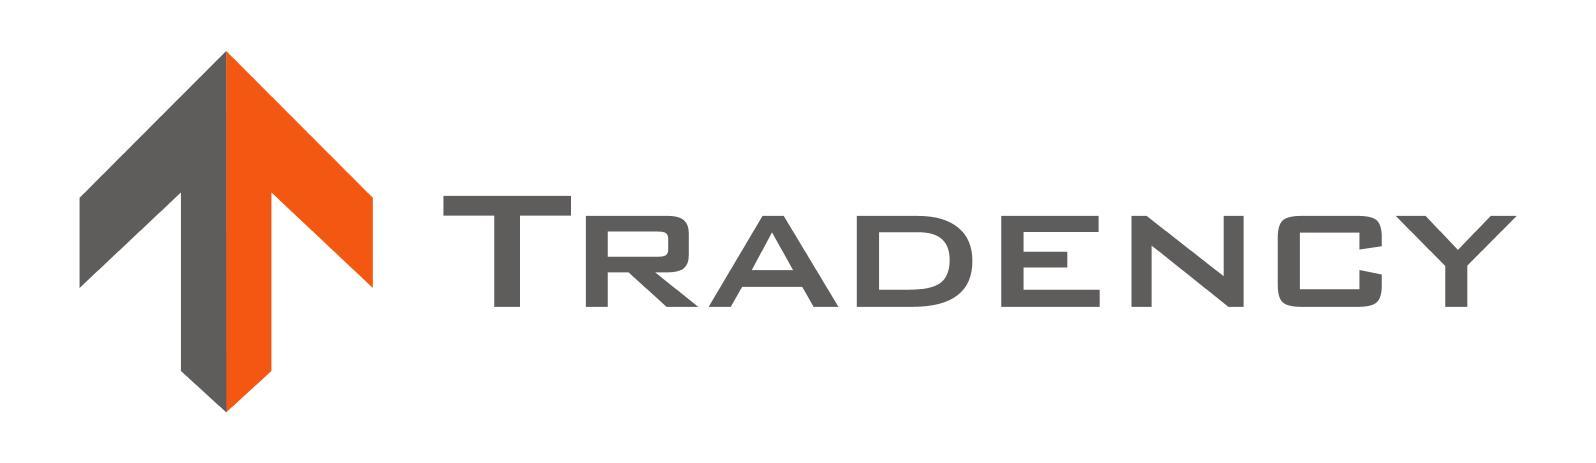 11800814-tradency-logo-wide